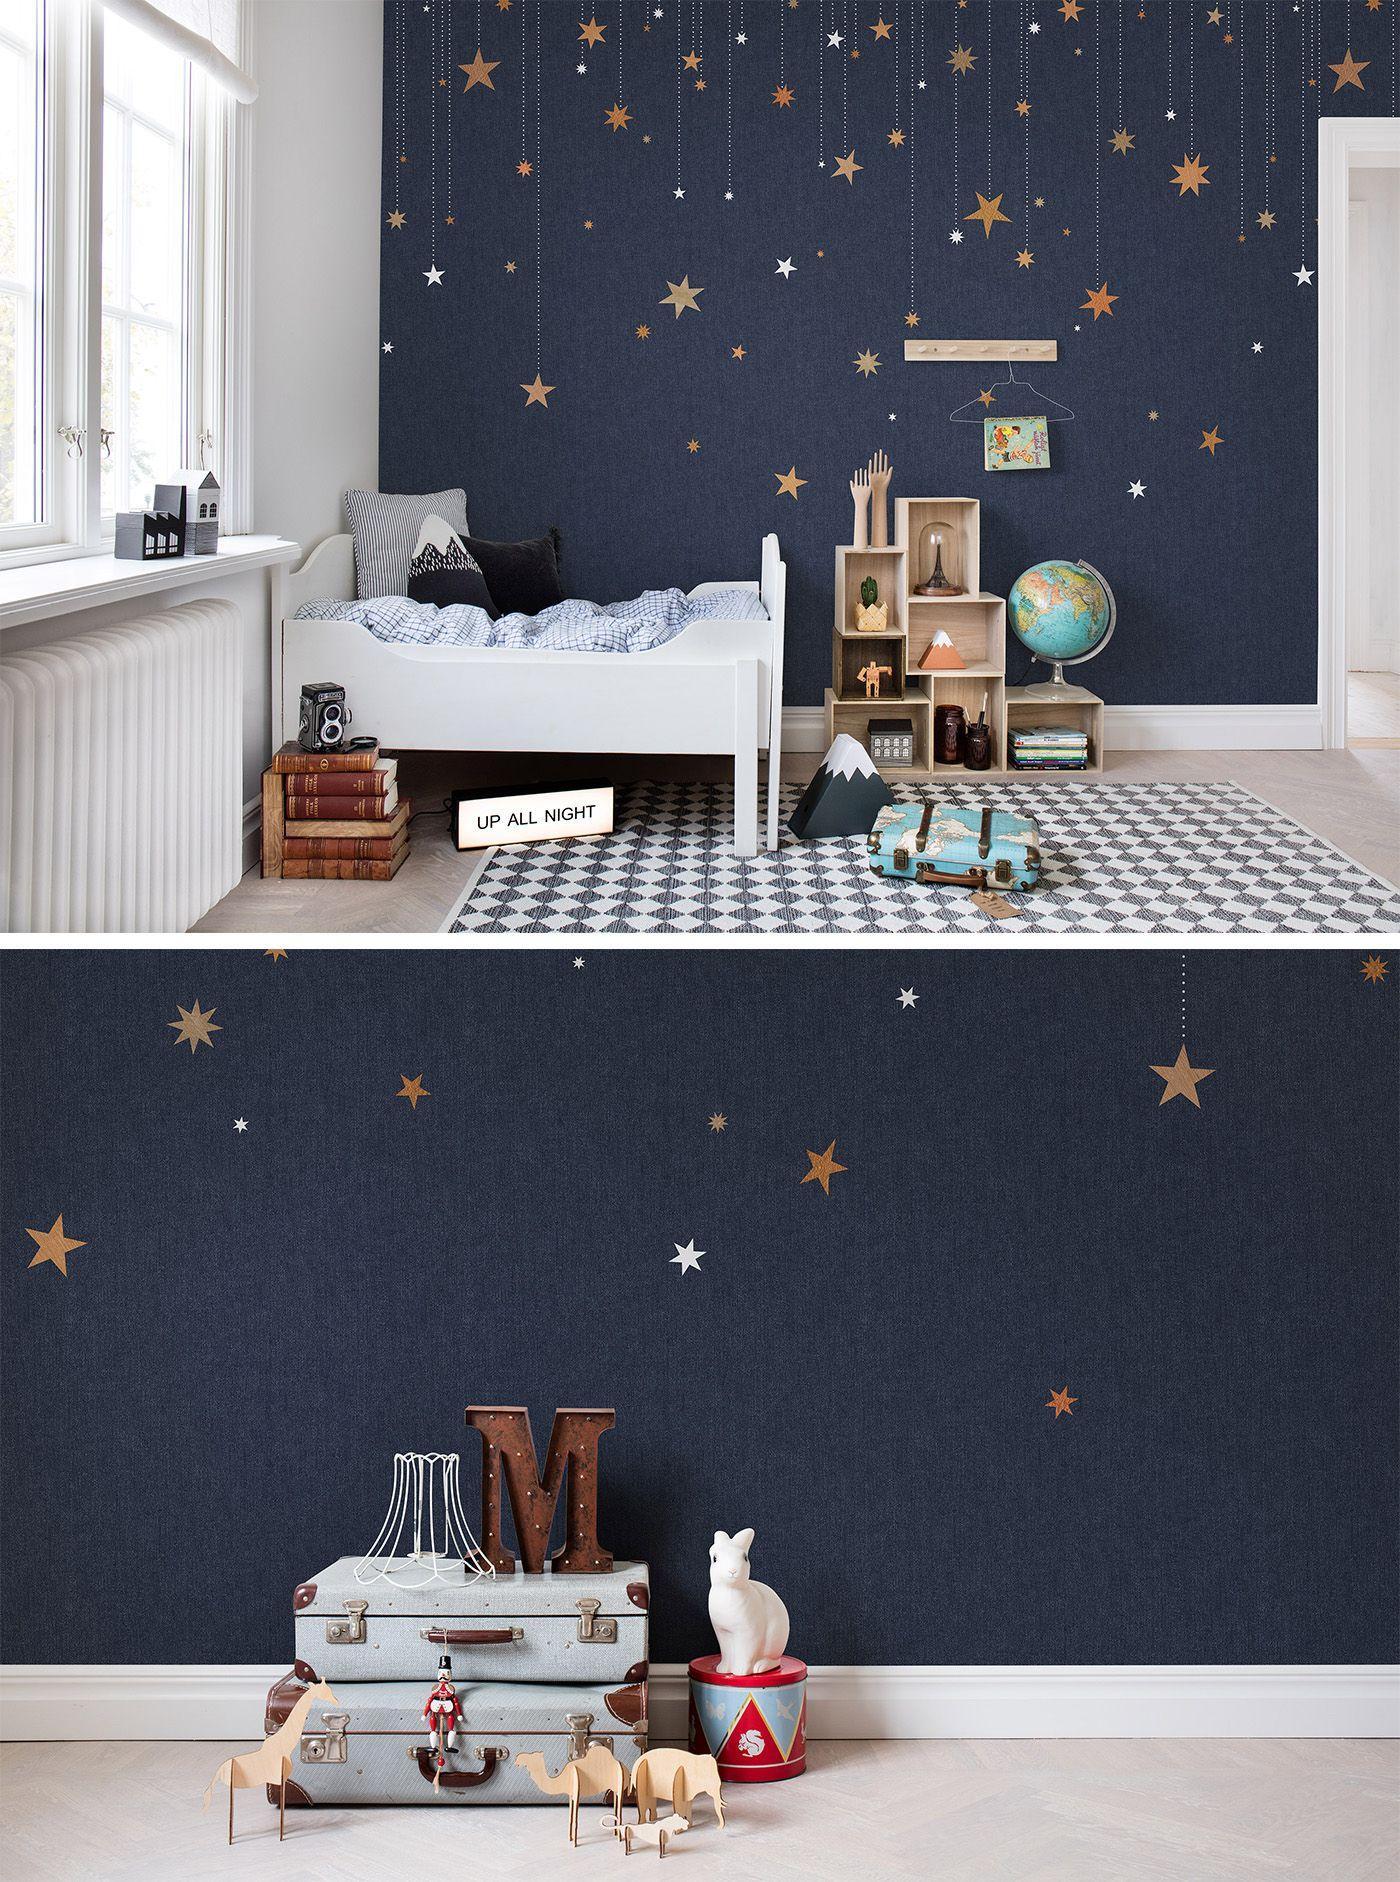 Full Size of Sternenhimmel Kinderzimmer Stargazing Tapete Regal Weiß Regale Sofa Kinderzimmer Sternenhimmel Kinderzimmer